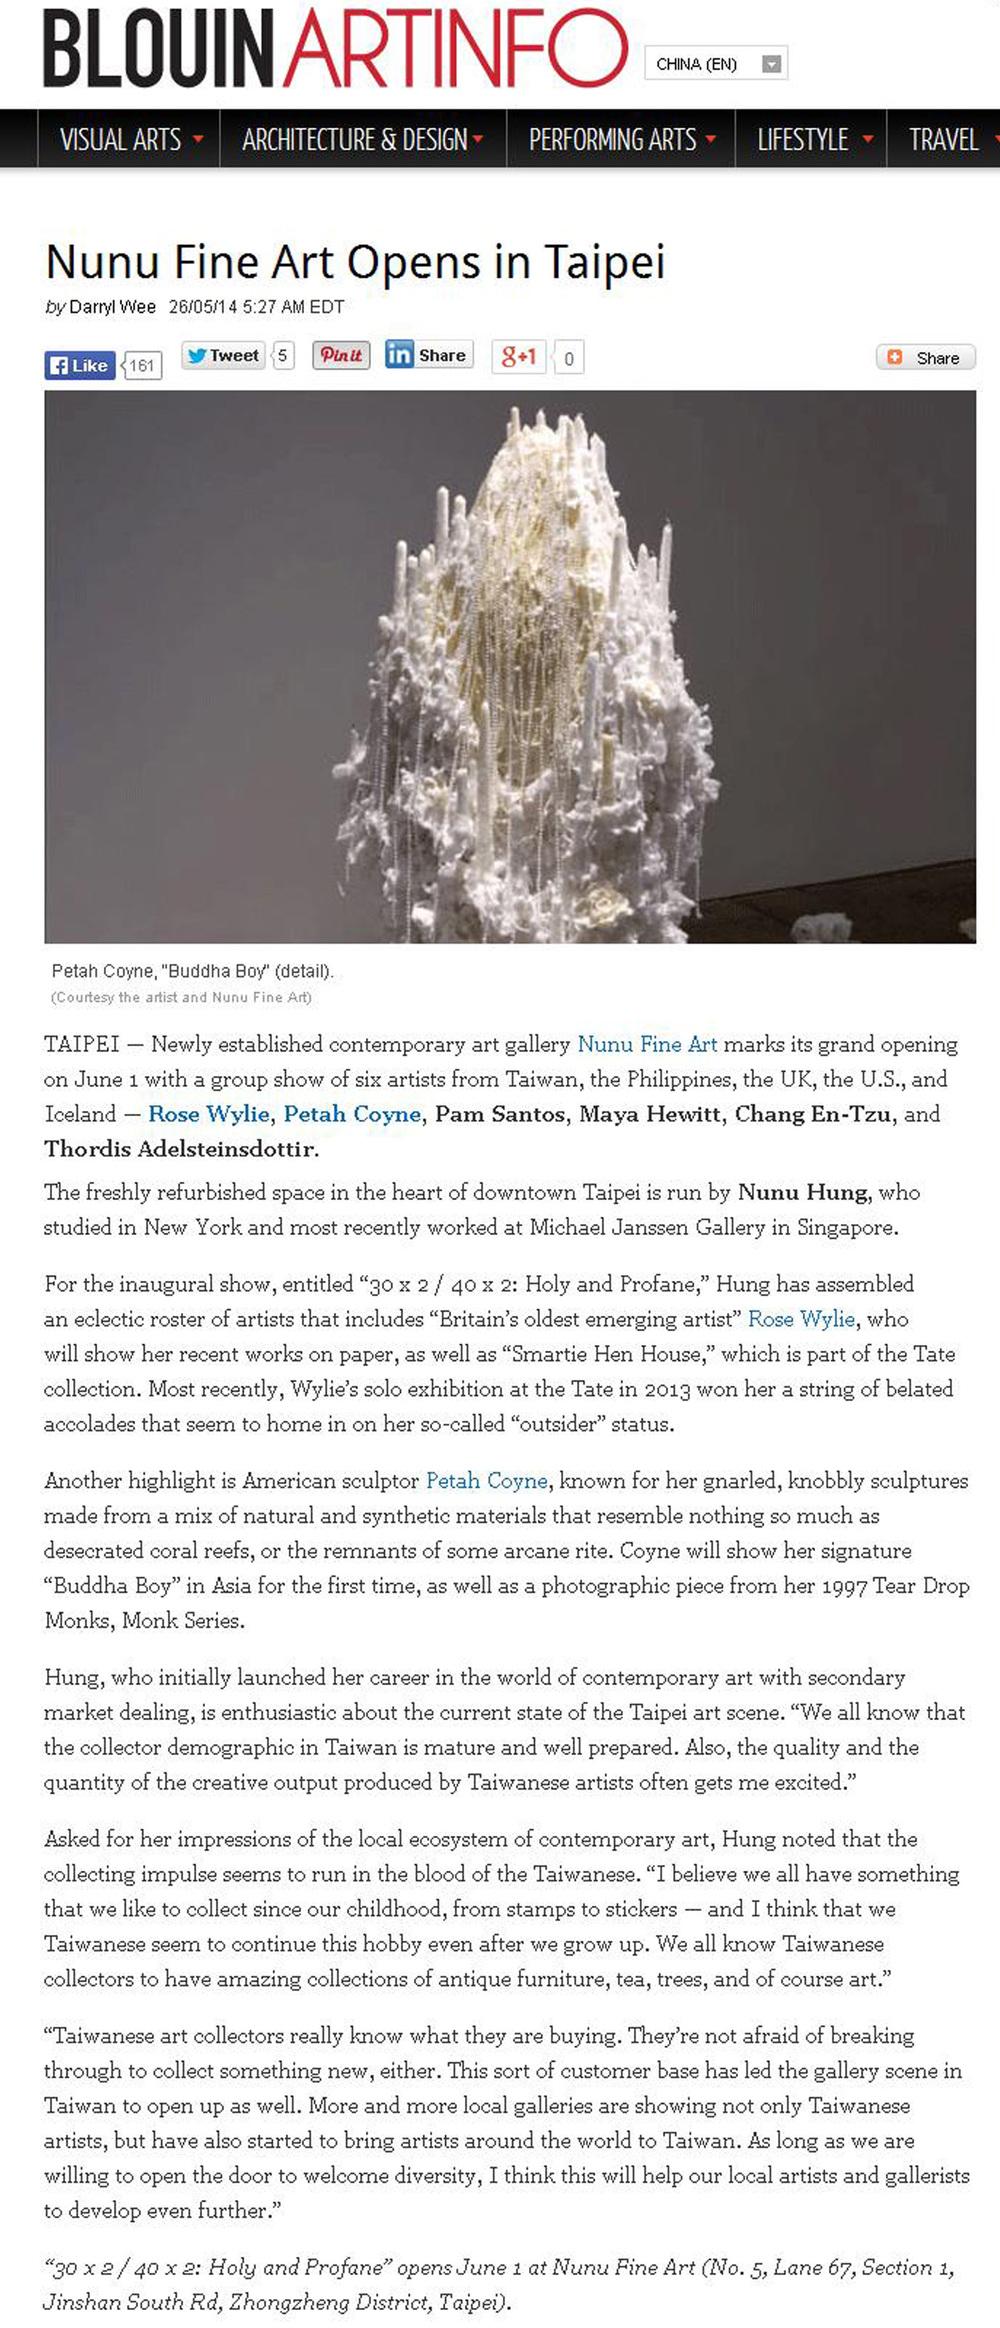 ARTINFO 2014年5月26日